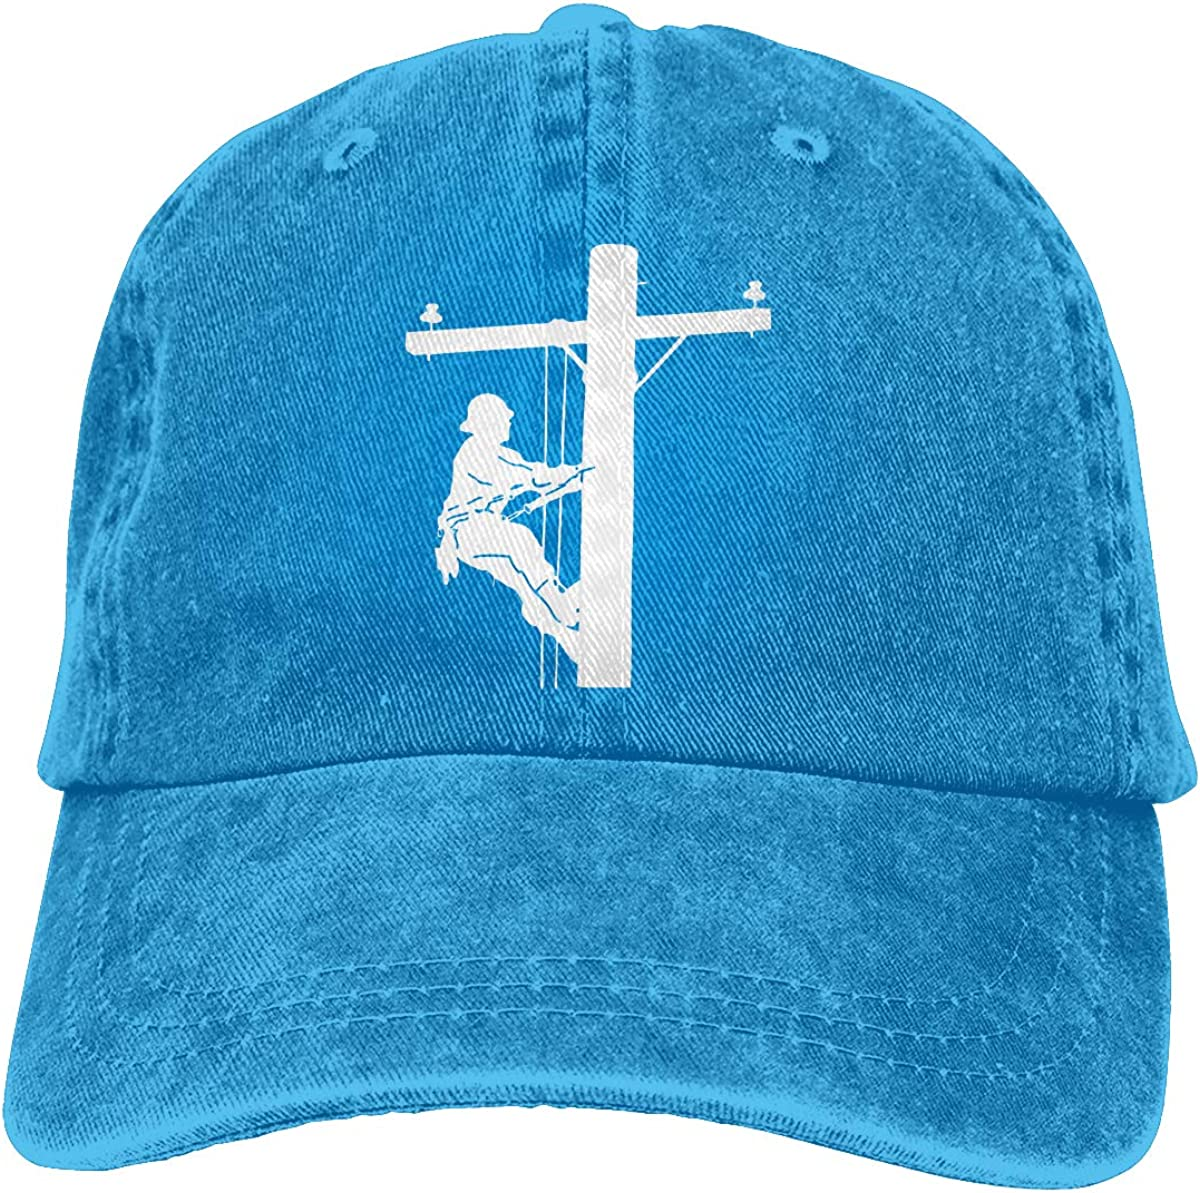 Lineman Fashion Unisex Washed Cap Adjustable Dads Denim Stetson Hat